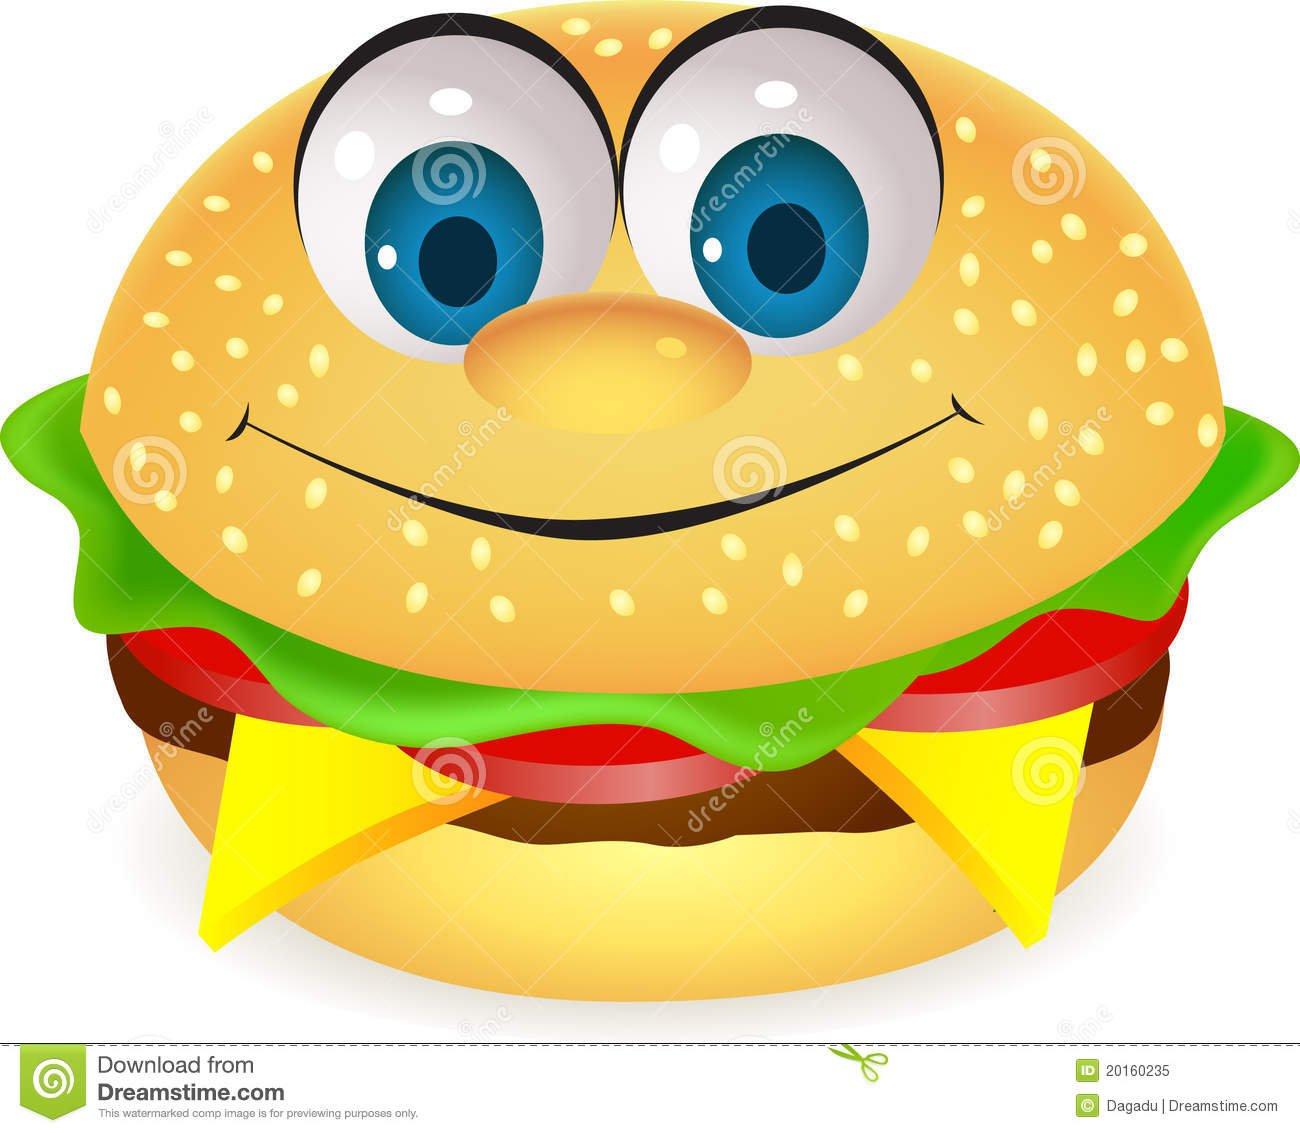 Foto De Stock Royalty Free  Funny Burger Cartoon  Imagem  20160235